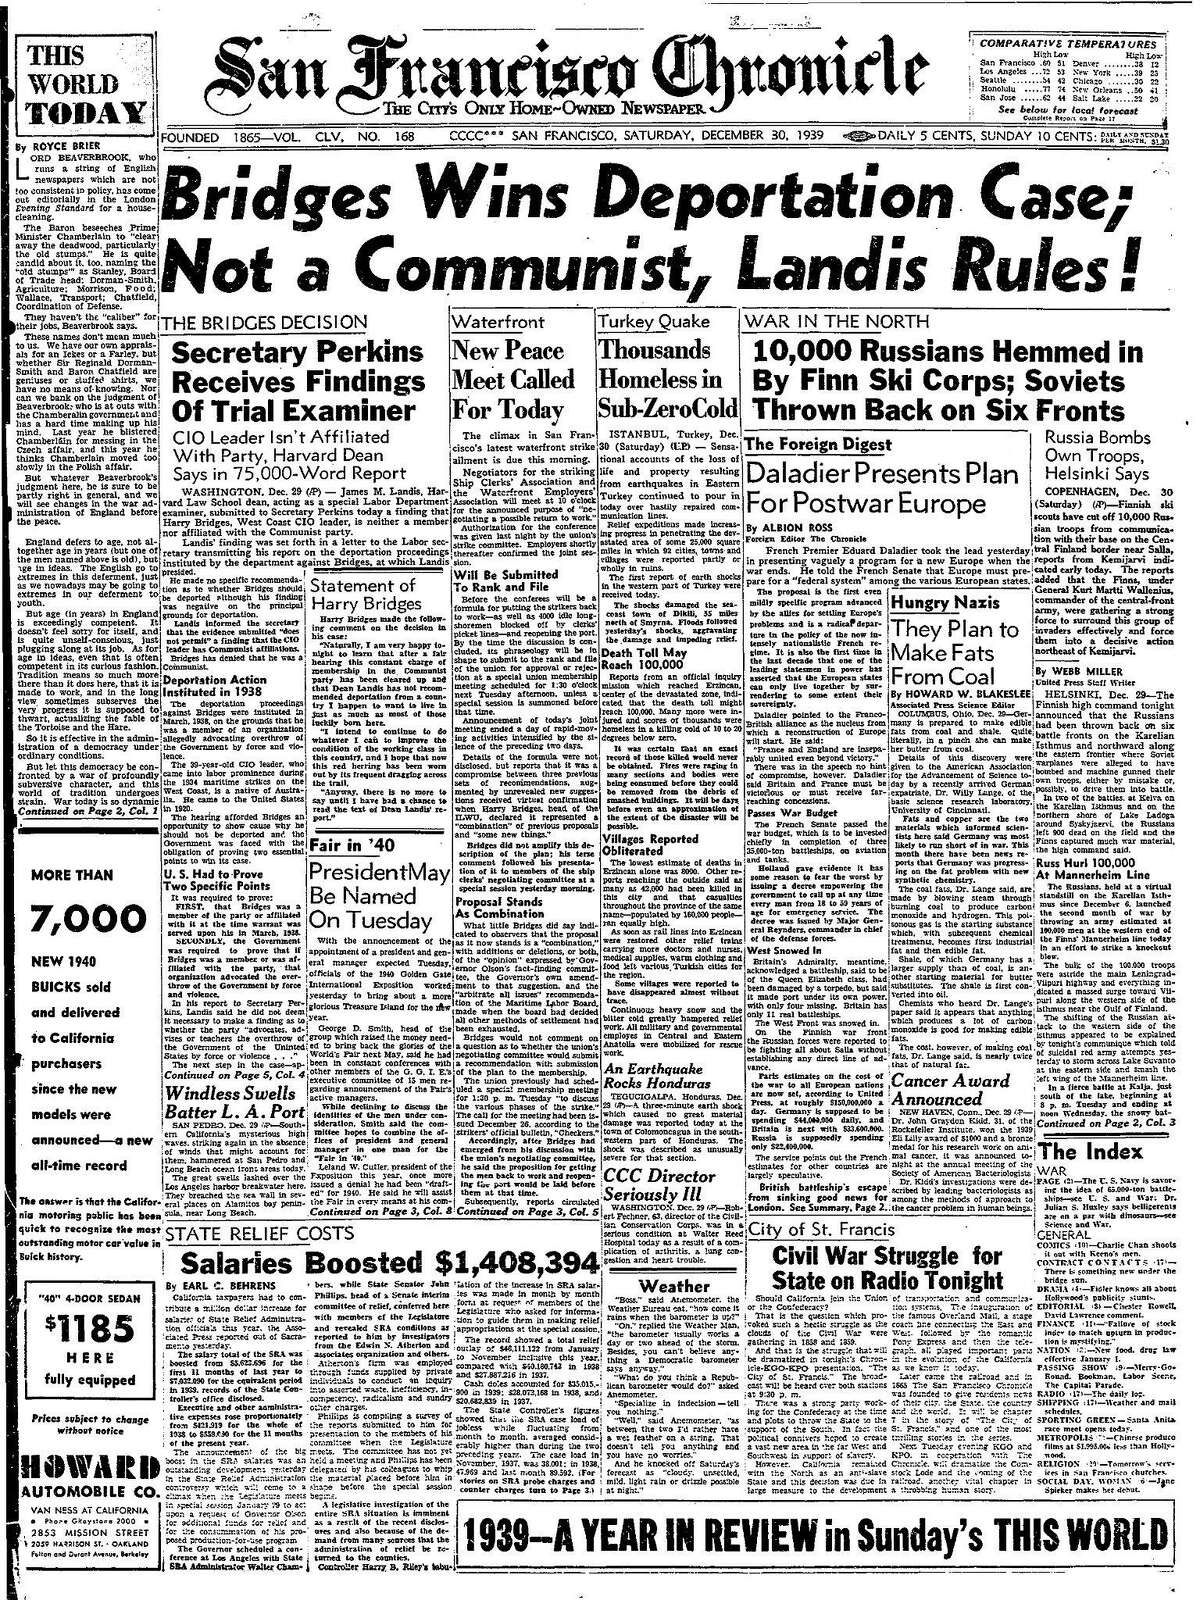 Historic Chronicle Front Page December 30, 1939 San Francisco labor leader Harry Bridges wins deportation case Chron365, Chroncover